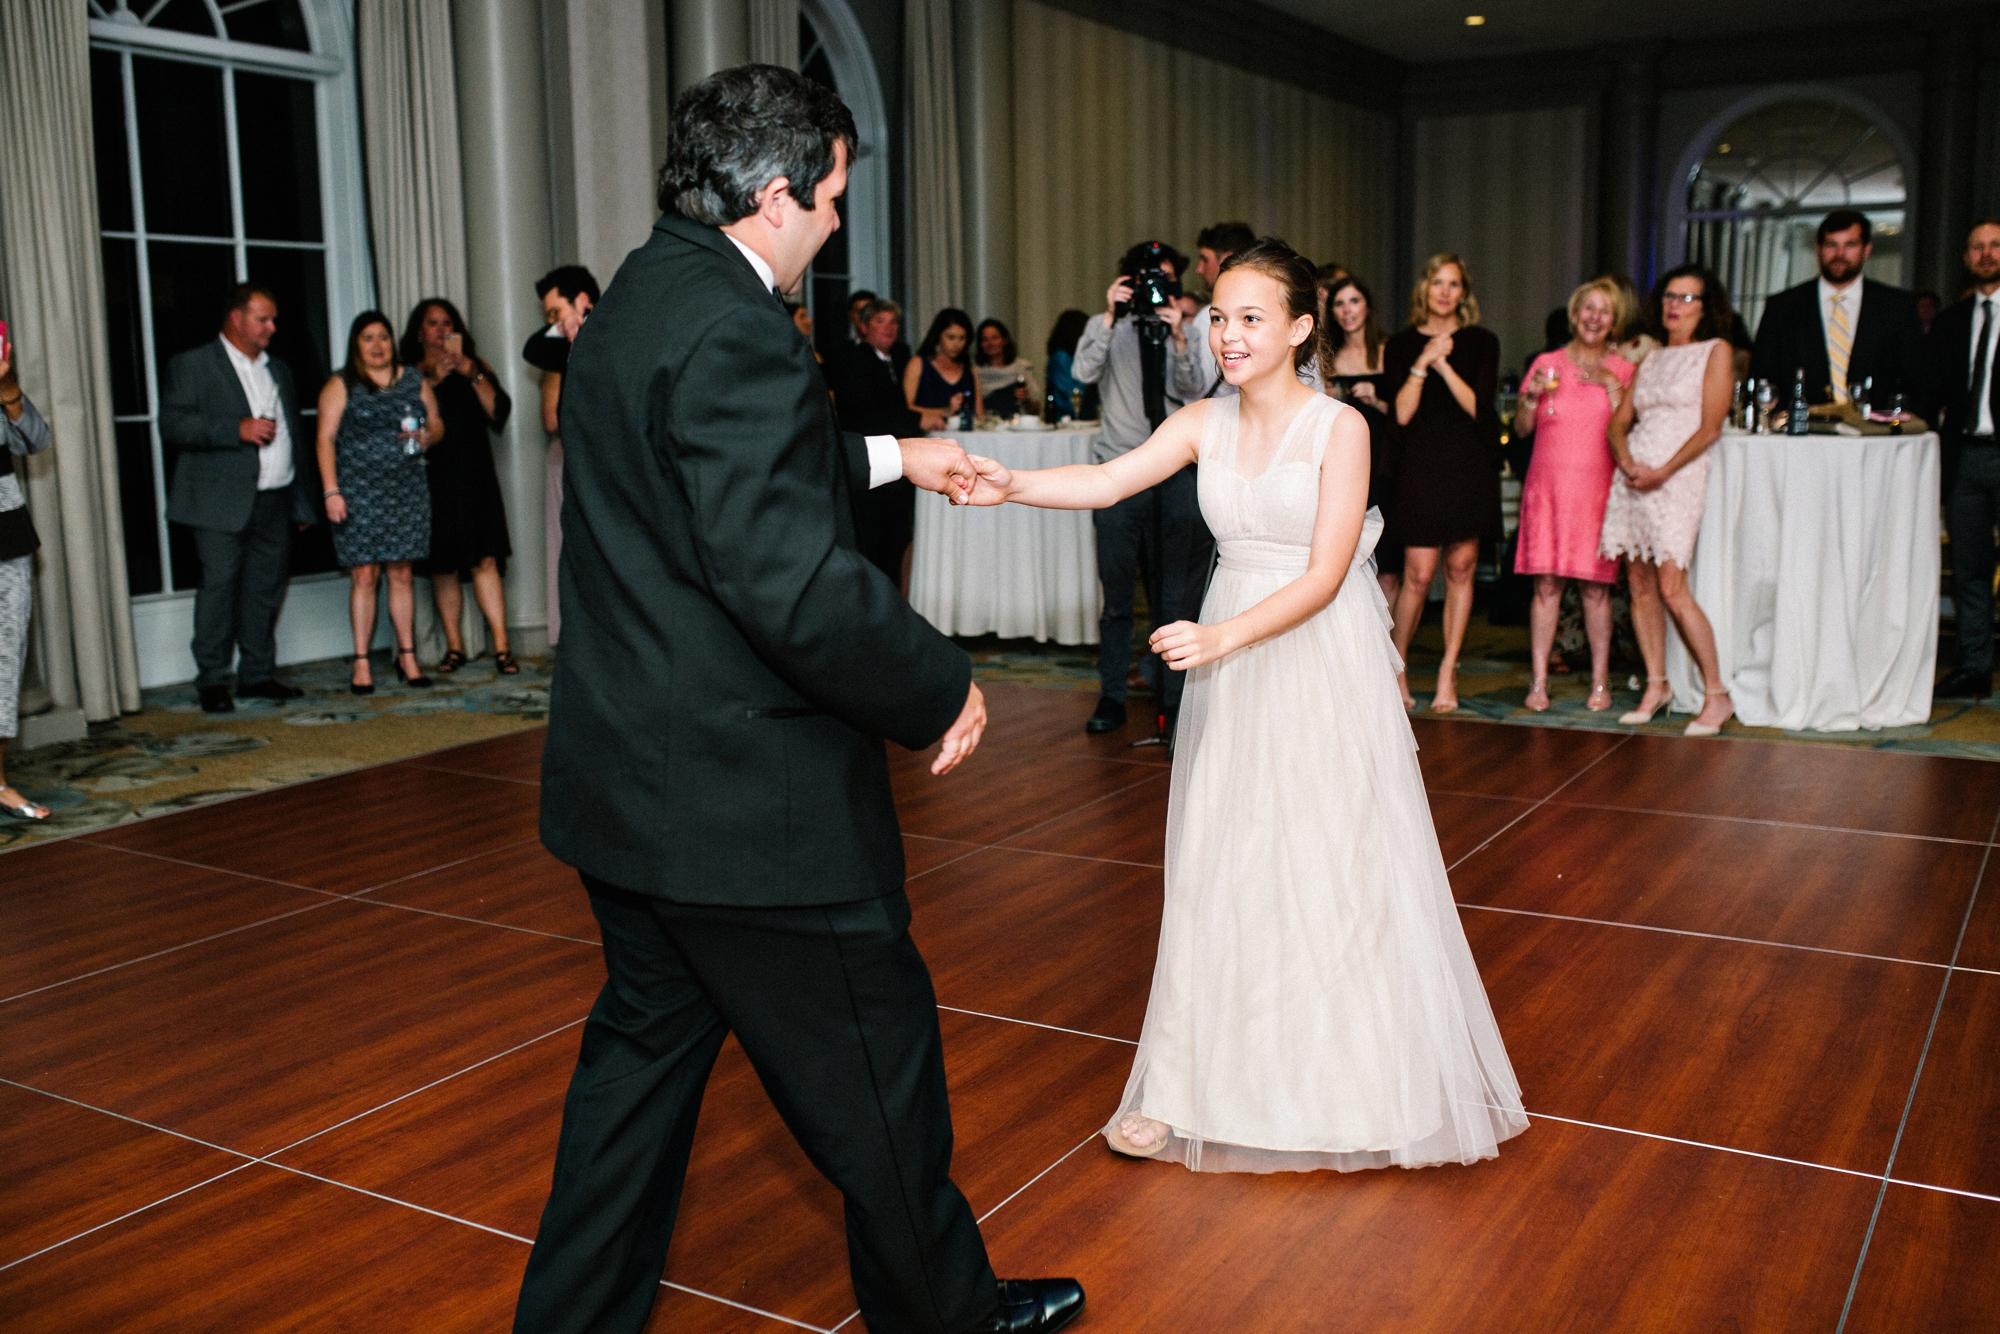 New_Orleans_Wedding_Photographer_0641.jpg